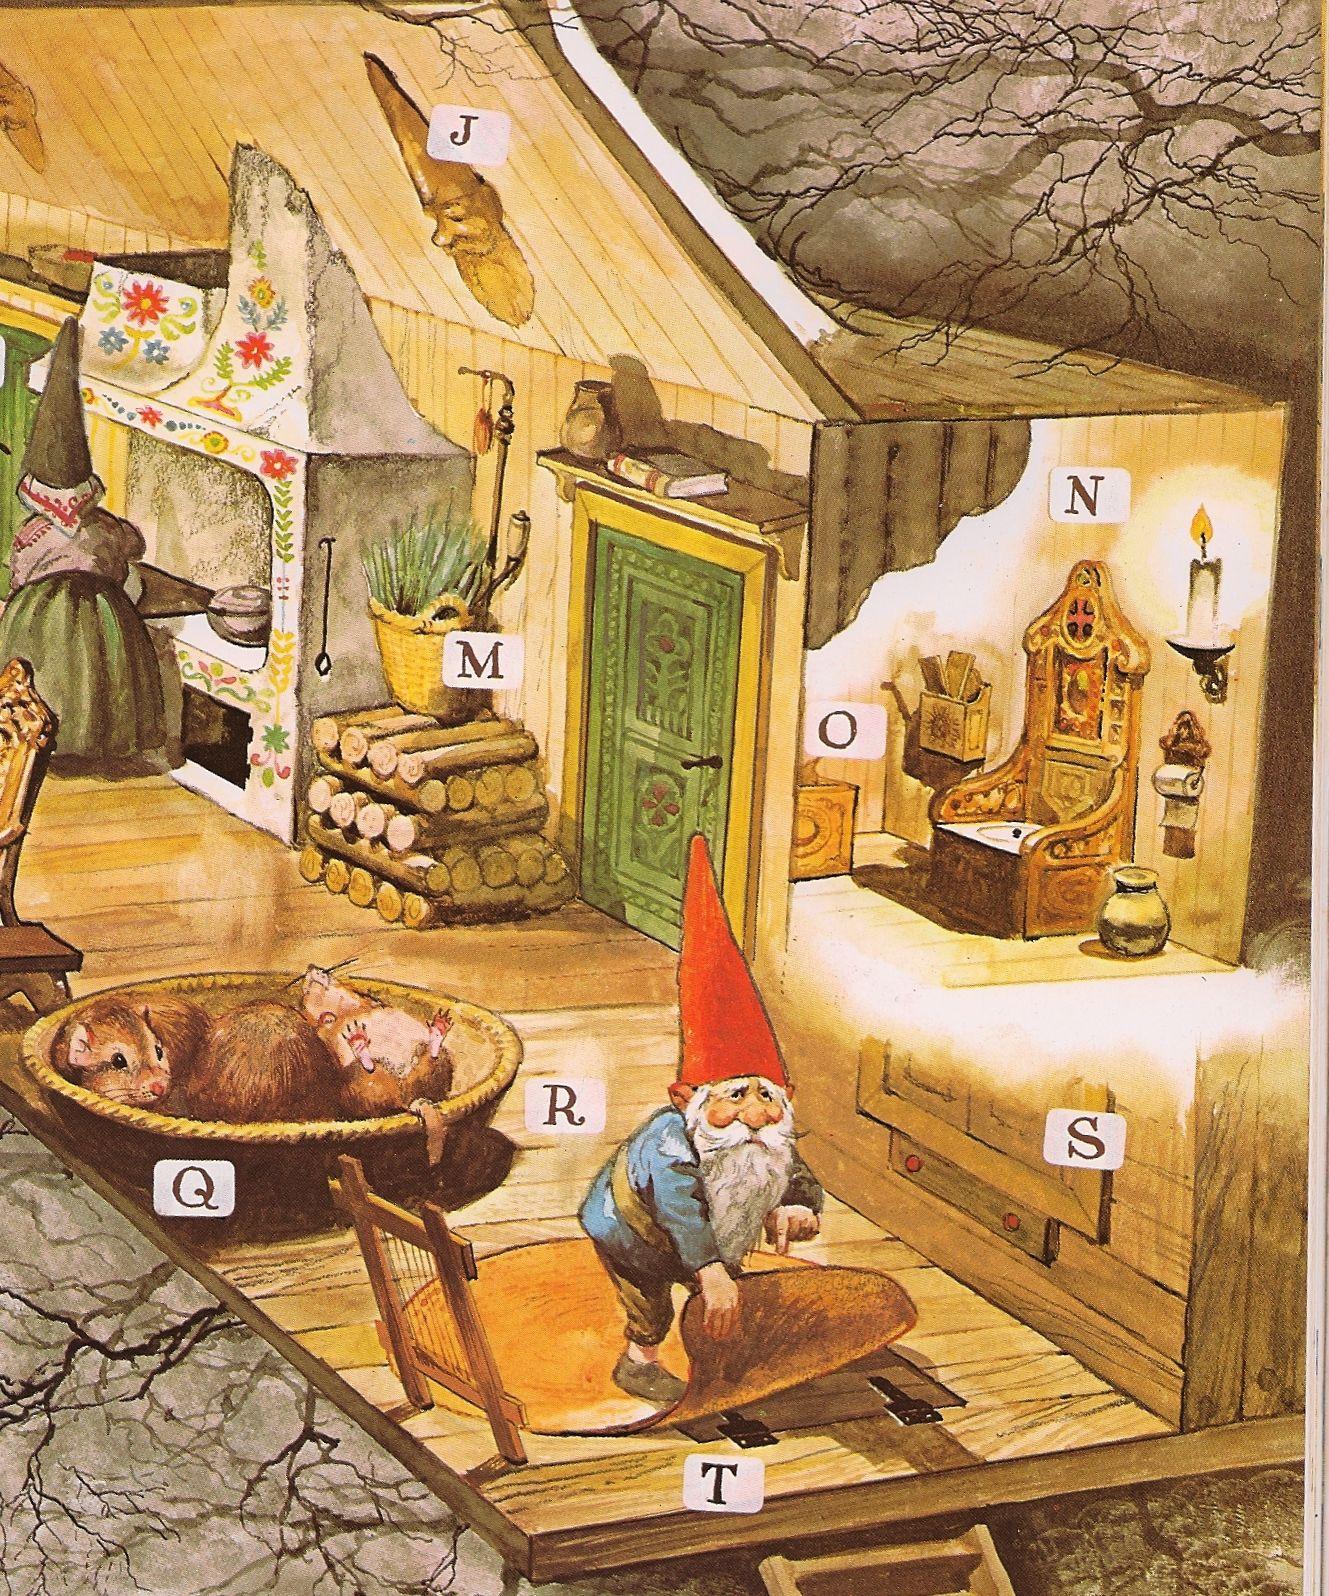 Pin Van Beck Hutchinson Op Gnomes David De Kabouter Kabouter Poortvliet